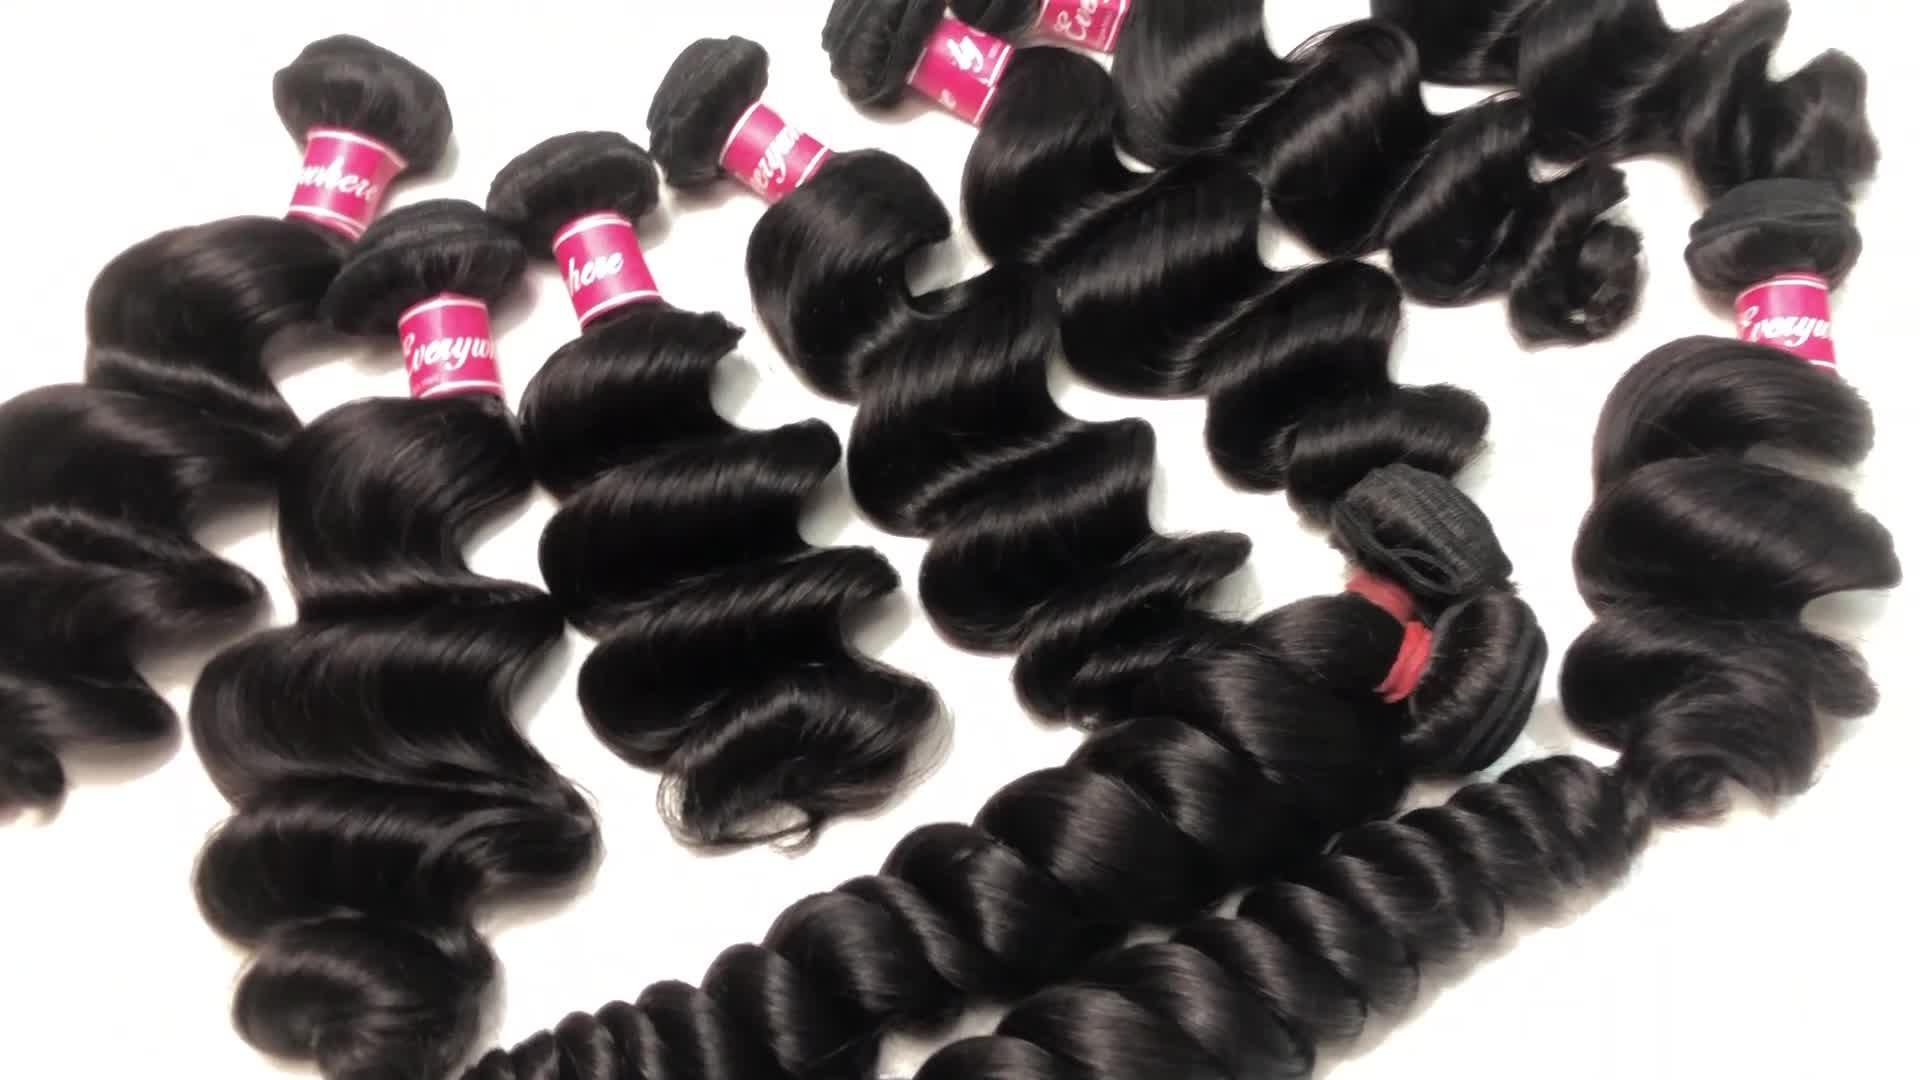 Free sample hair bundles raw virgin cuticle aligned hair, human hair weave bundle, wholesale double drawn 10a virgin hair vendor